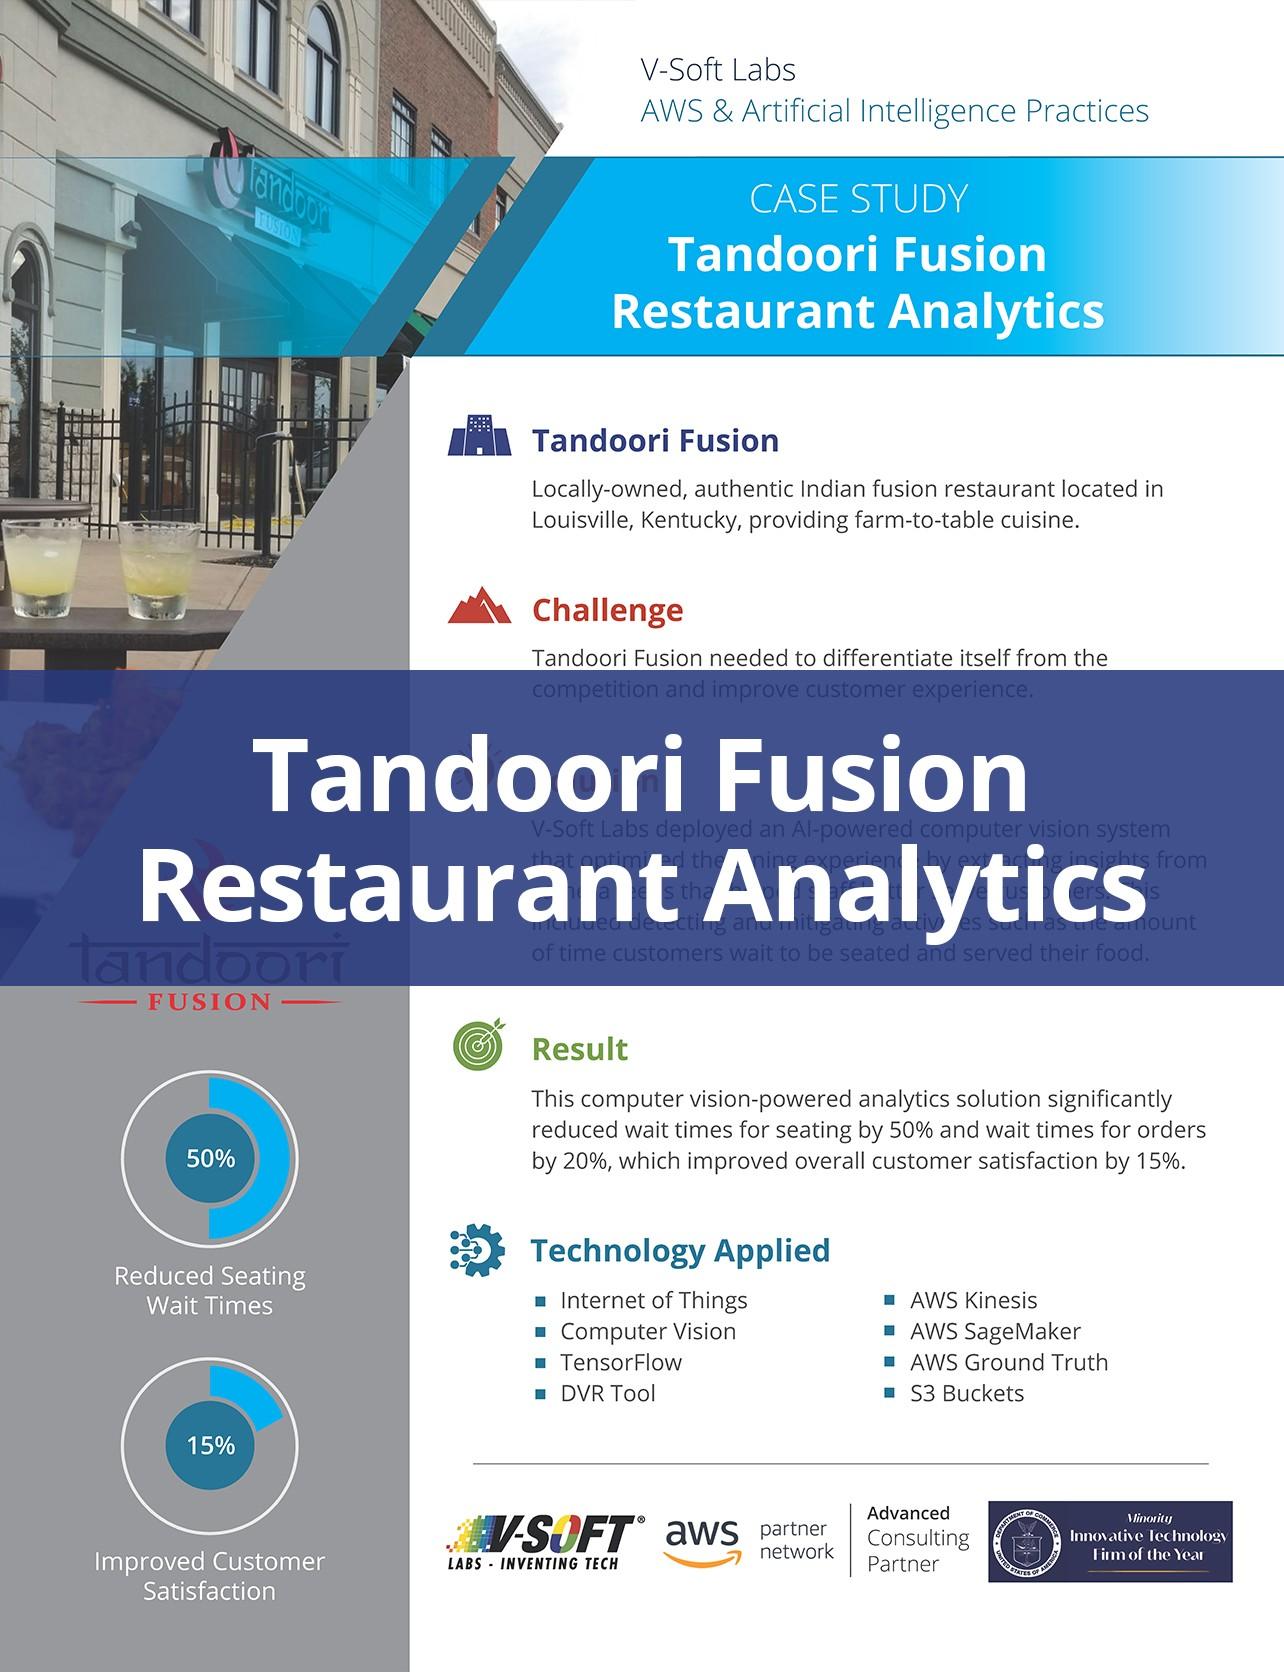 Tandoori Fusion Restaurant Analytics